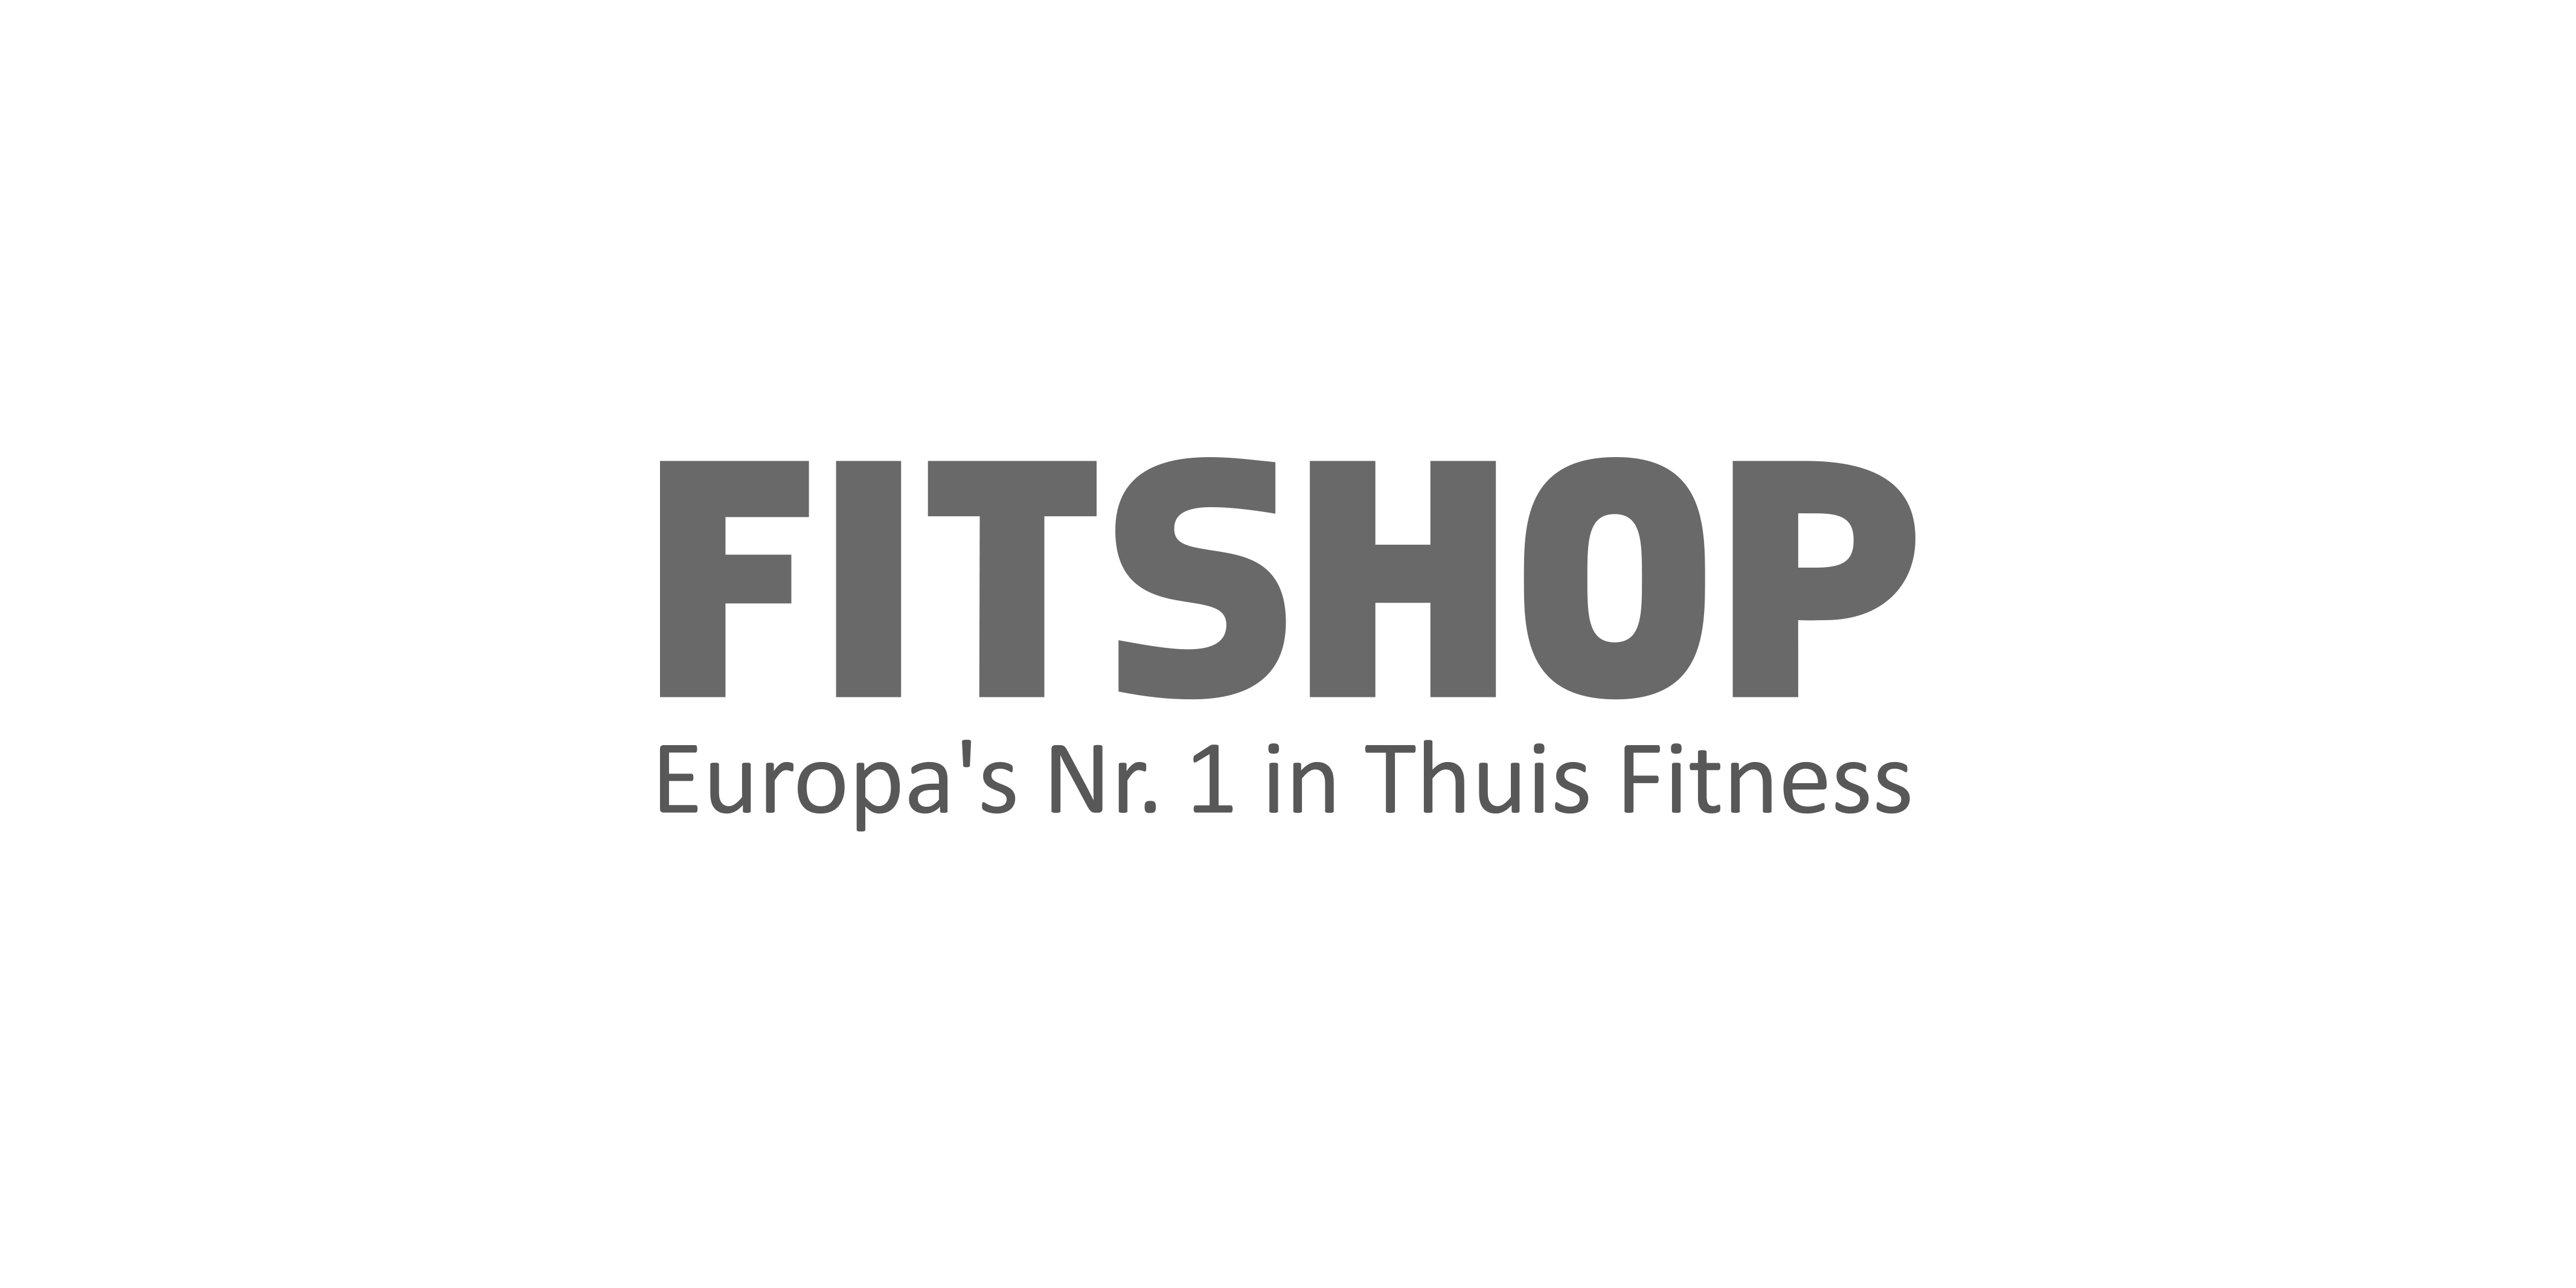 Fitshop - Europa's Nr. 1 in Thuis Fitness logo Fitfair Jaarbeurs